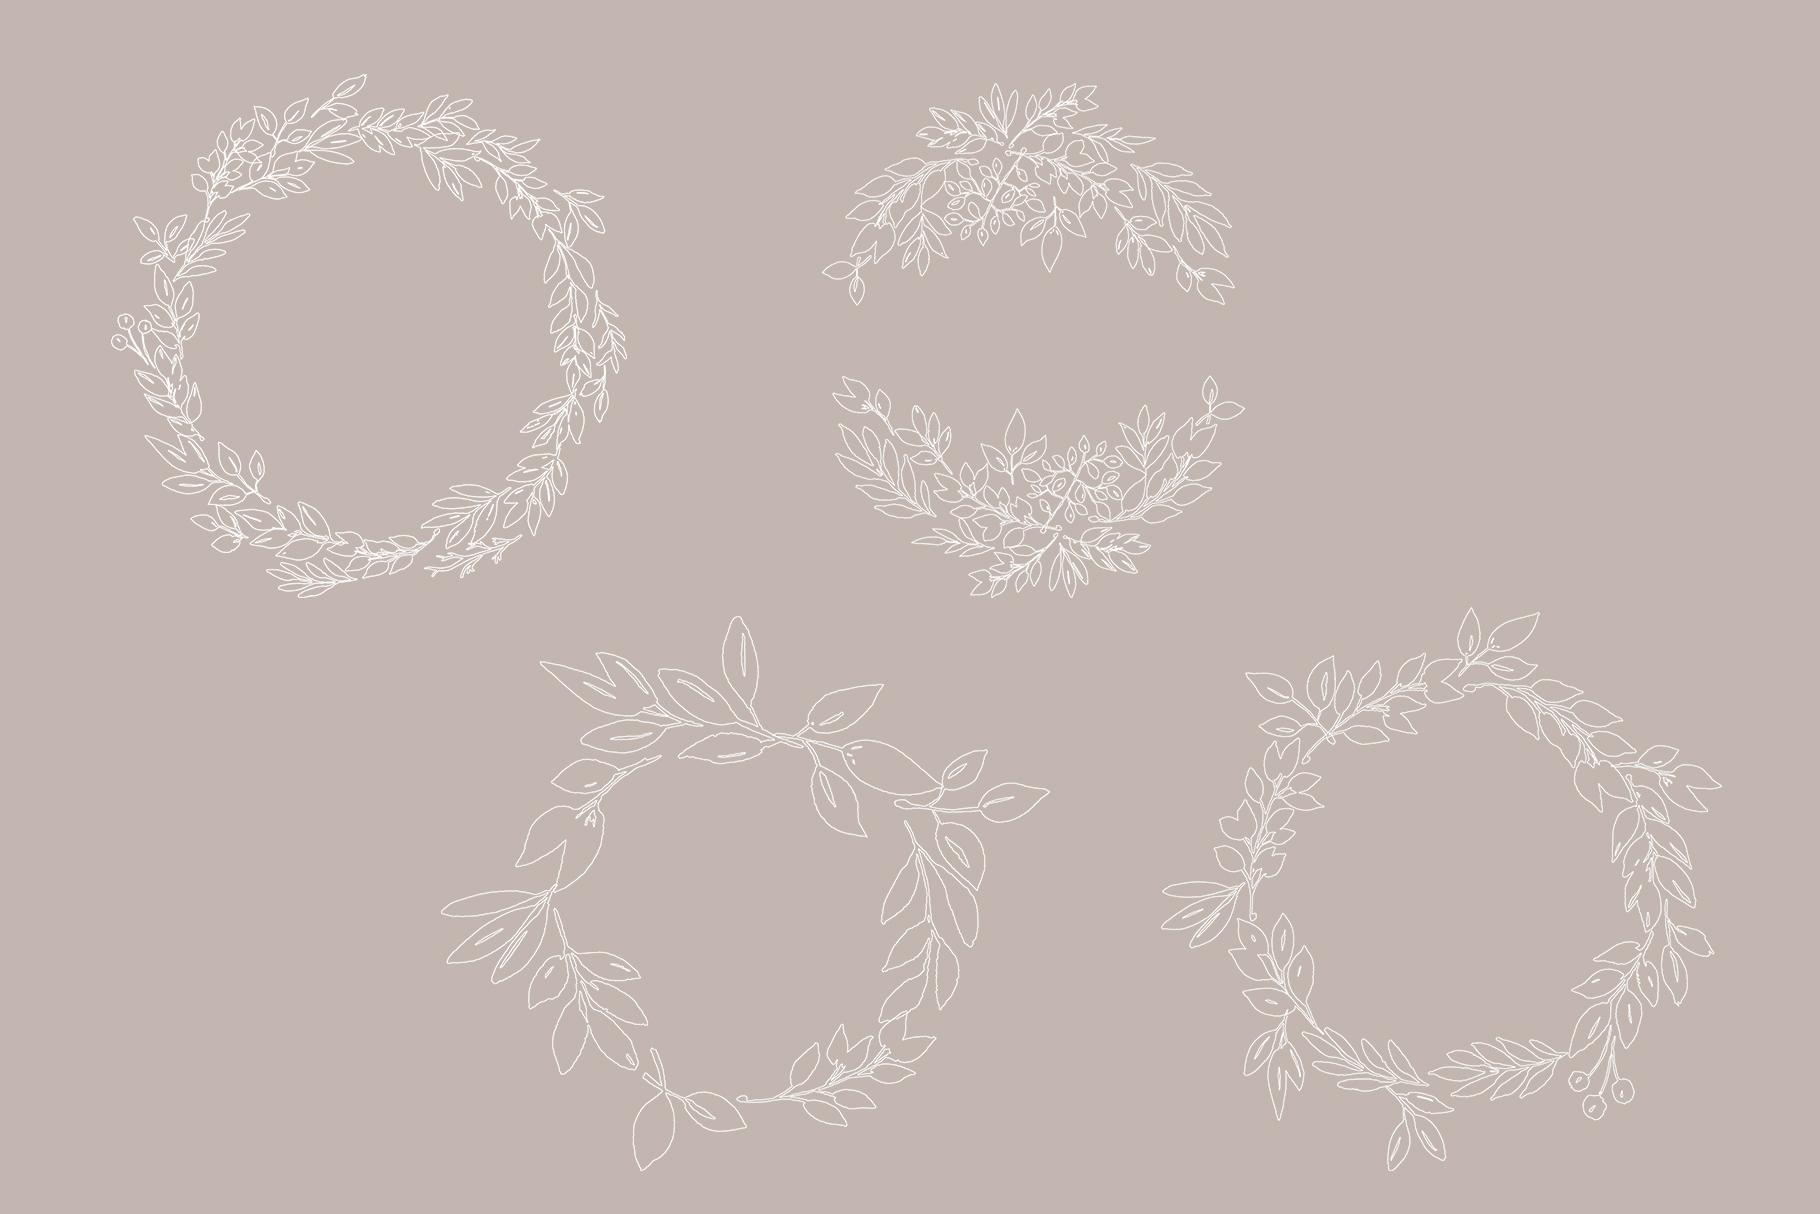 Foliage doodles clip art set, hand drawn foliage, hand drawn example image 6